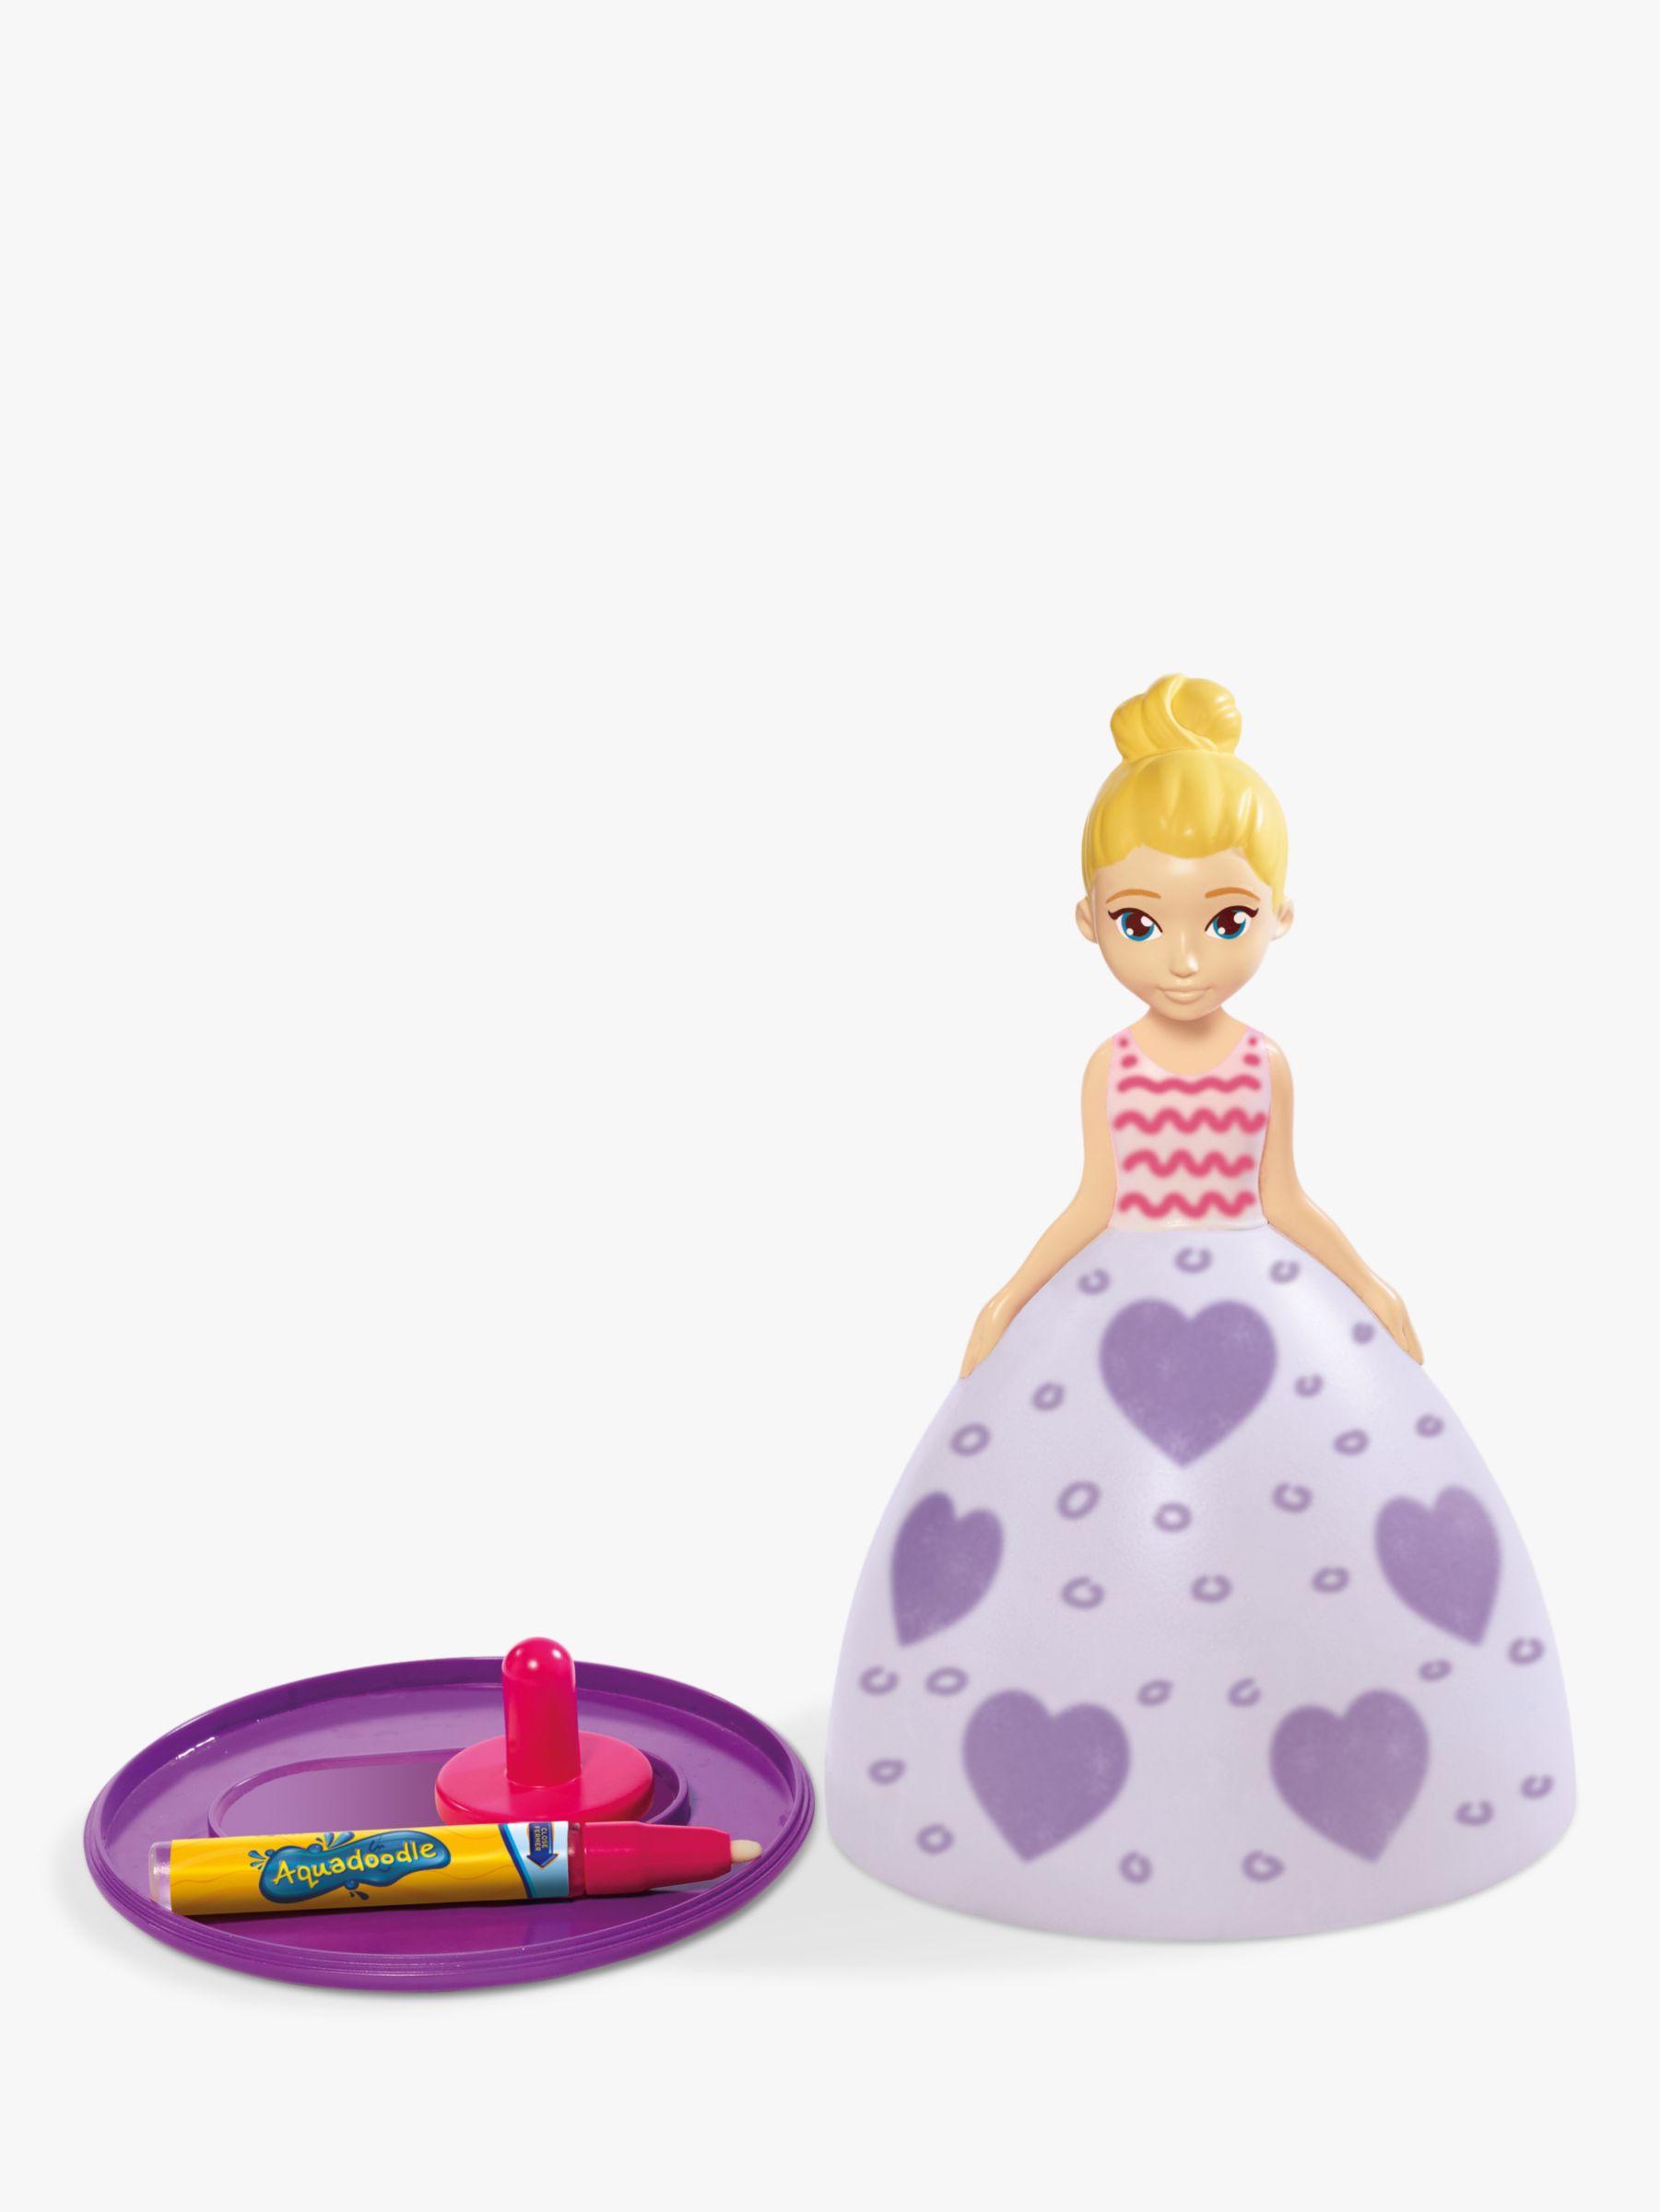 Tomy Aquadoodle Dress Designer Doll